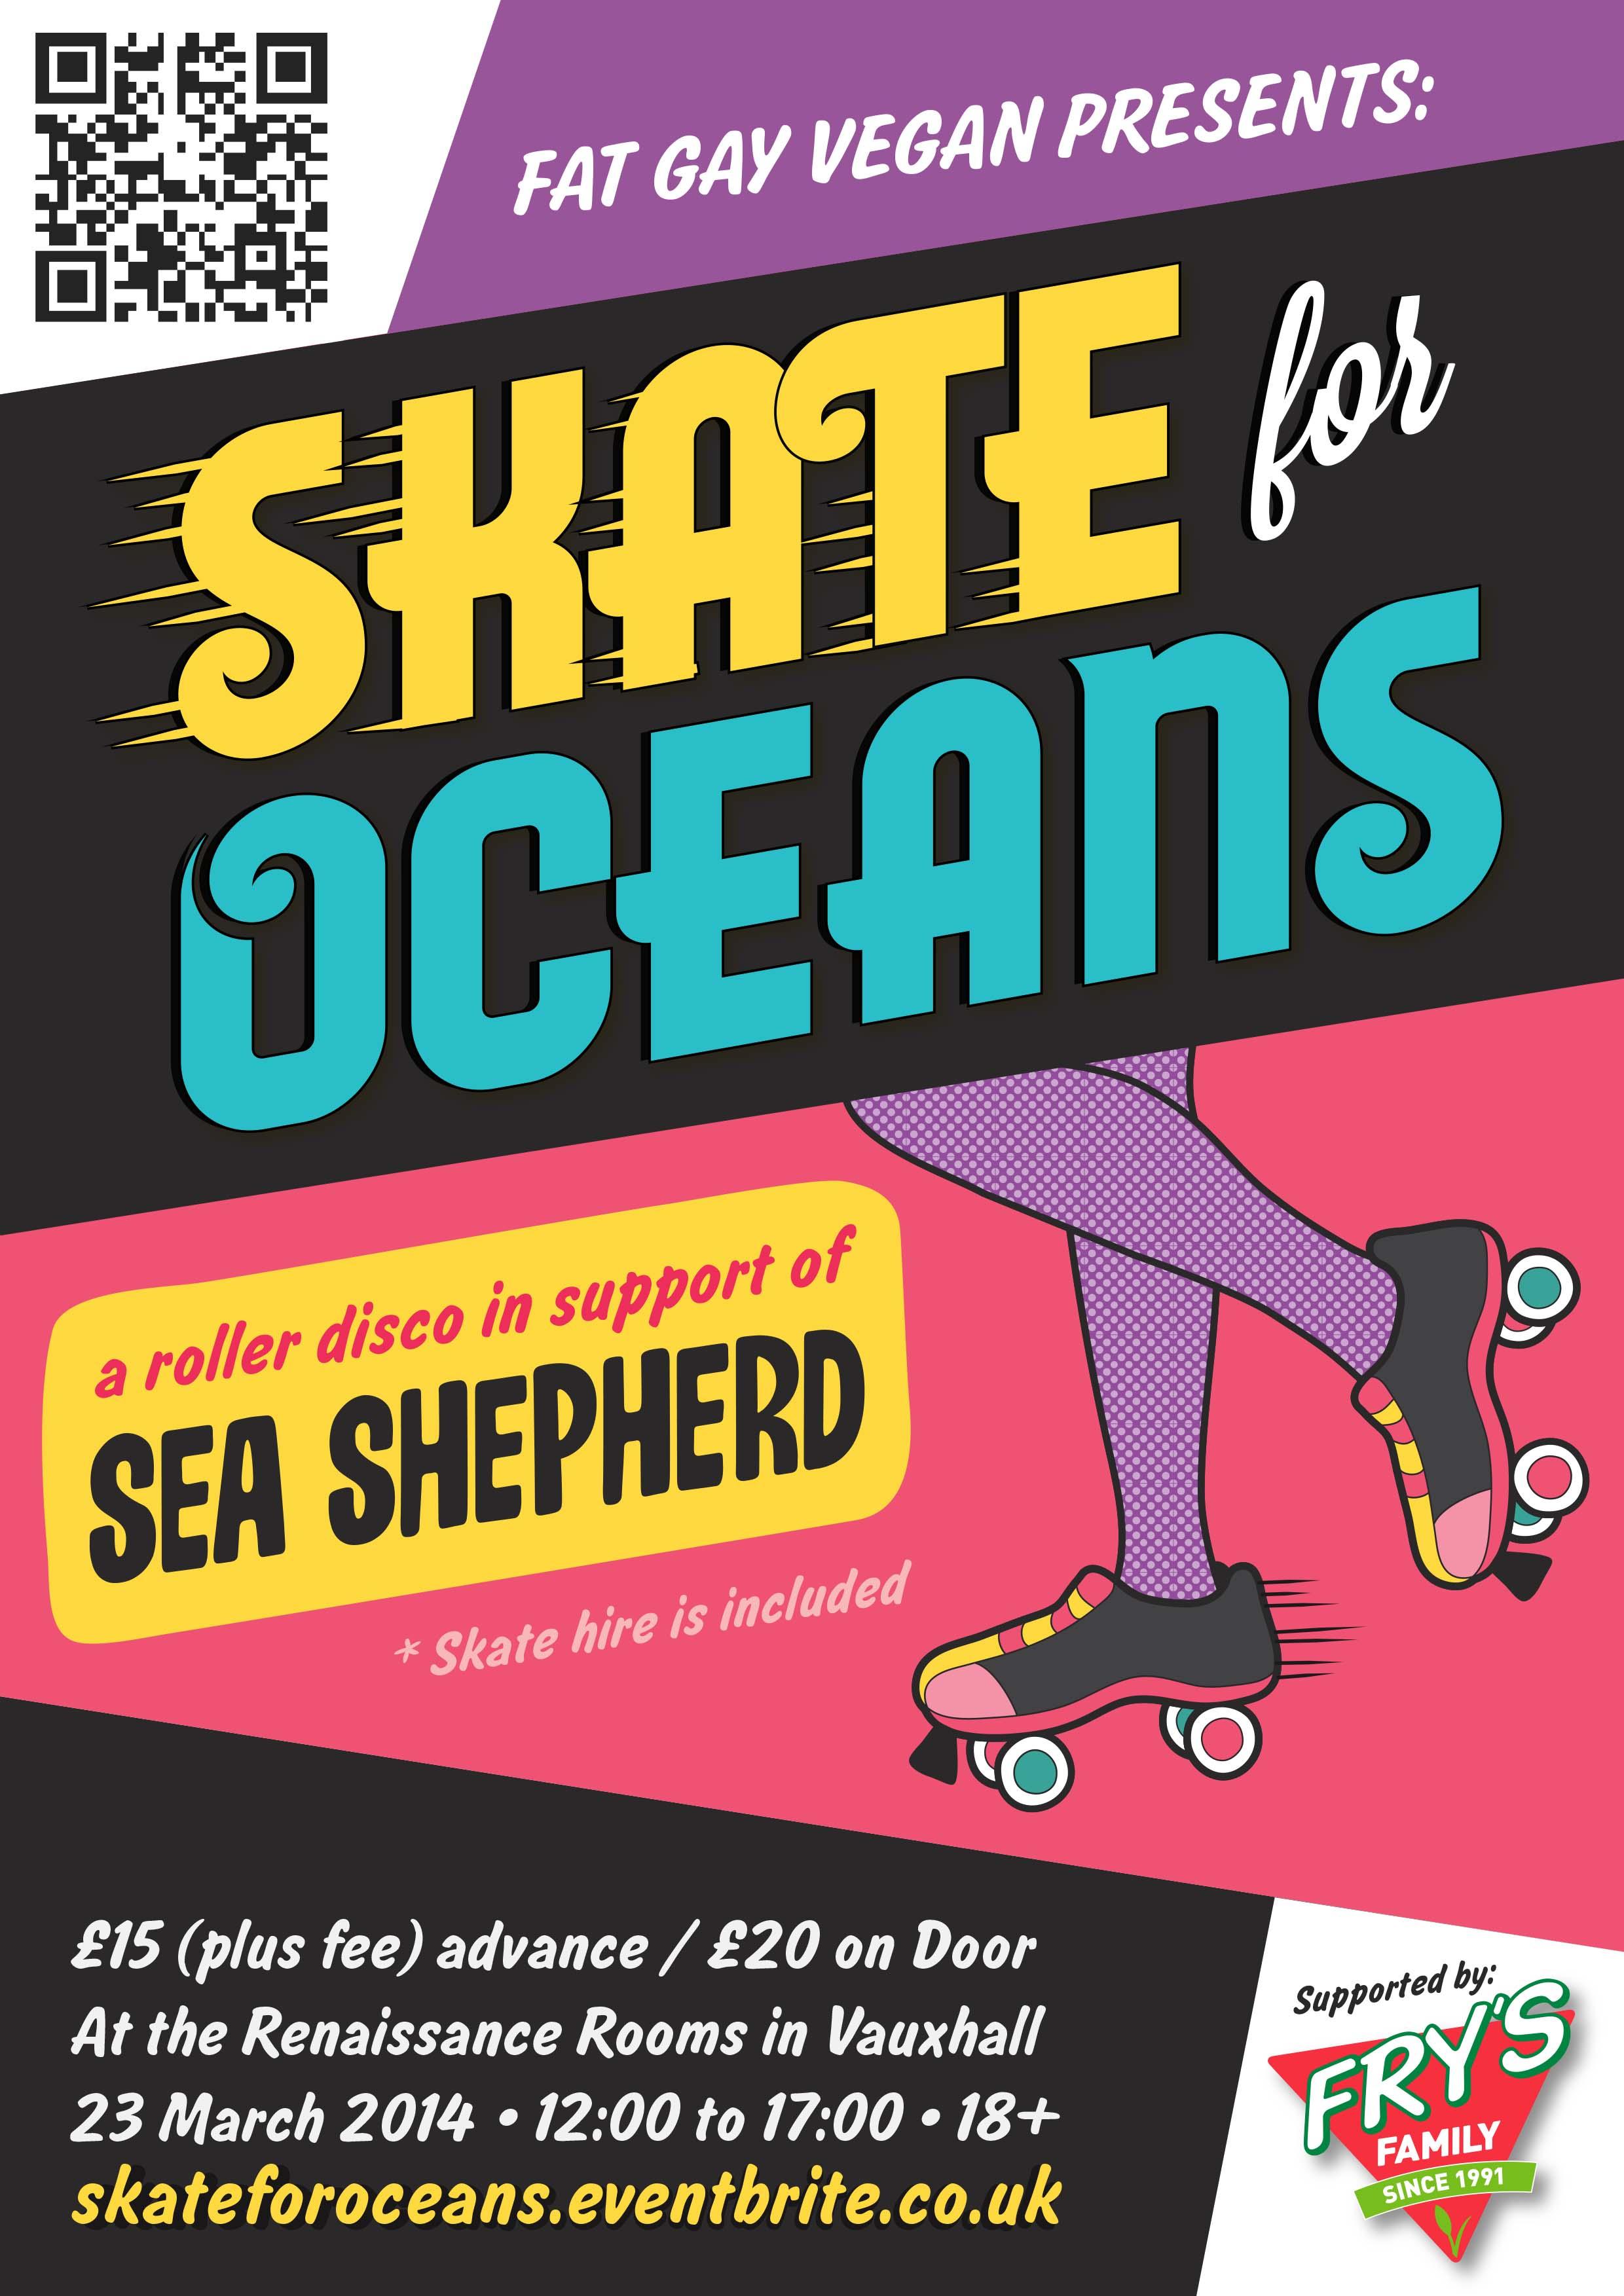 https://i2.wp.com/fatgayvegan.com/wp-content/uploads/2014/01/skate-for-oceans-2014-a4-poster-02.jpg?fit=2480%2C3507